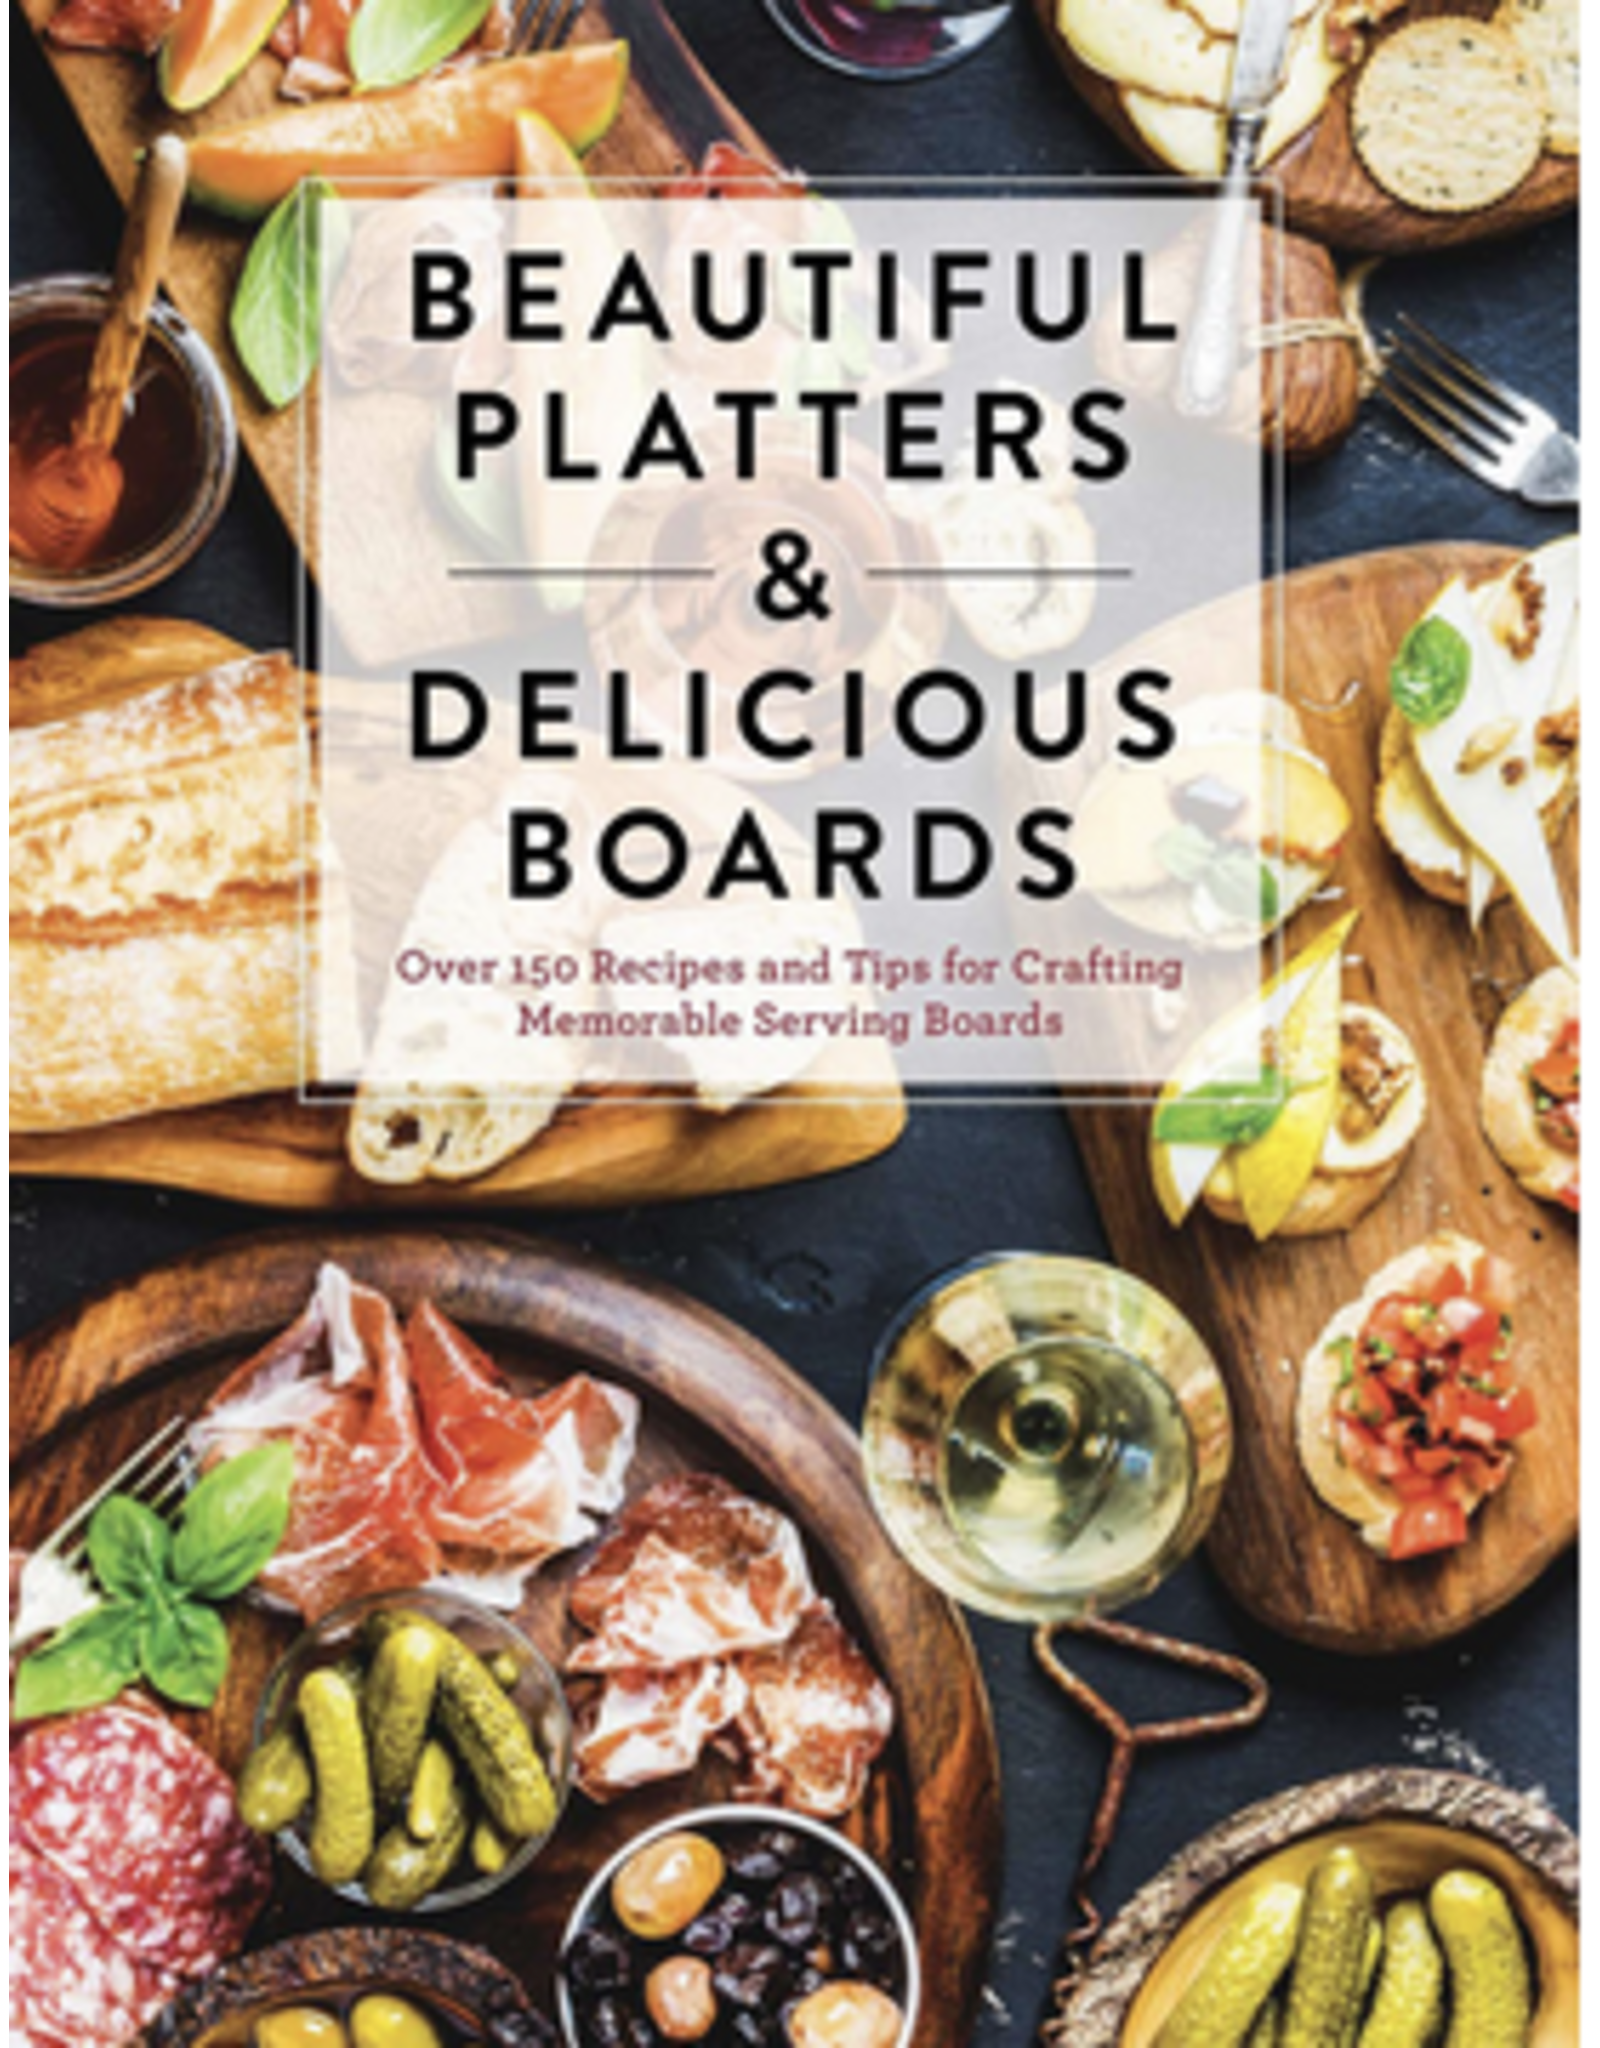 Website Beautiful Platters & Delicious Boards